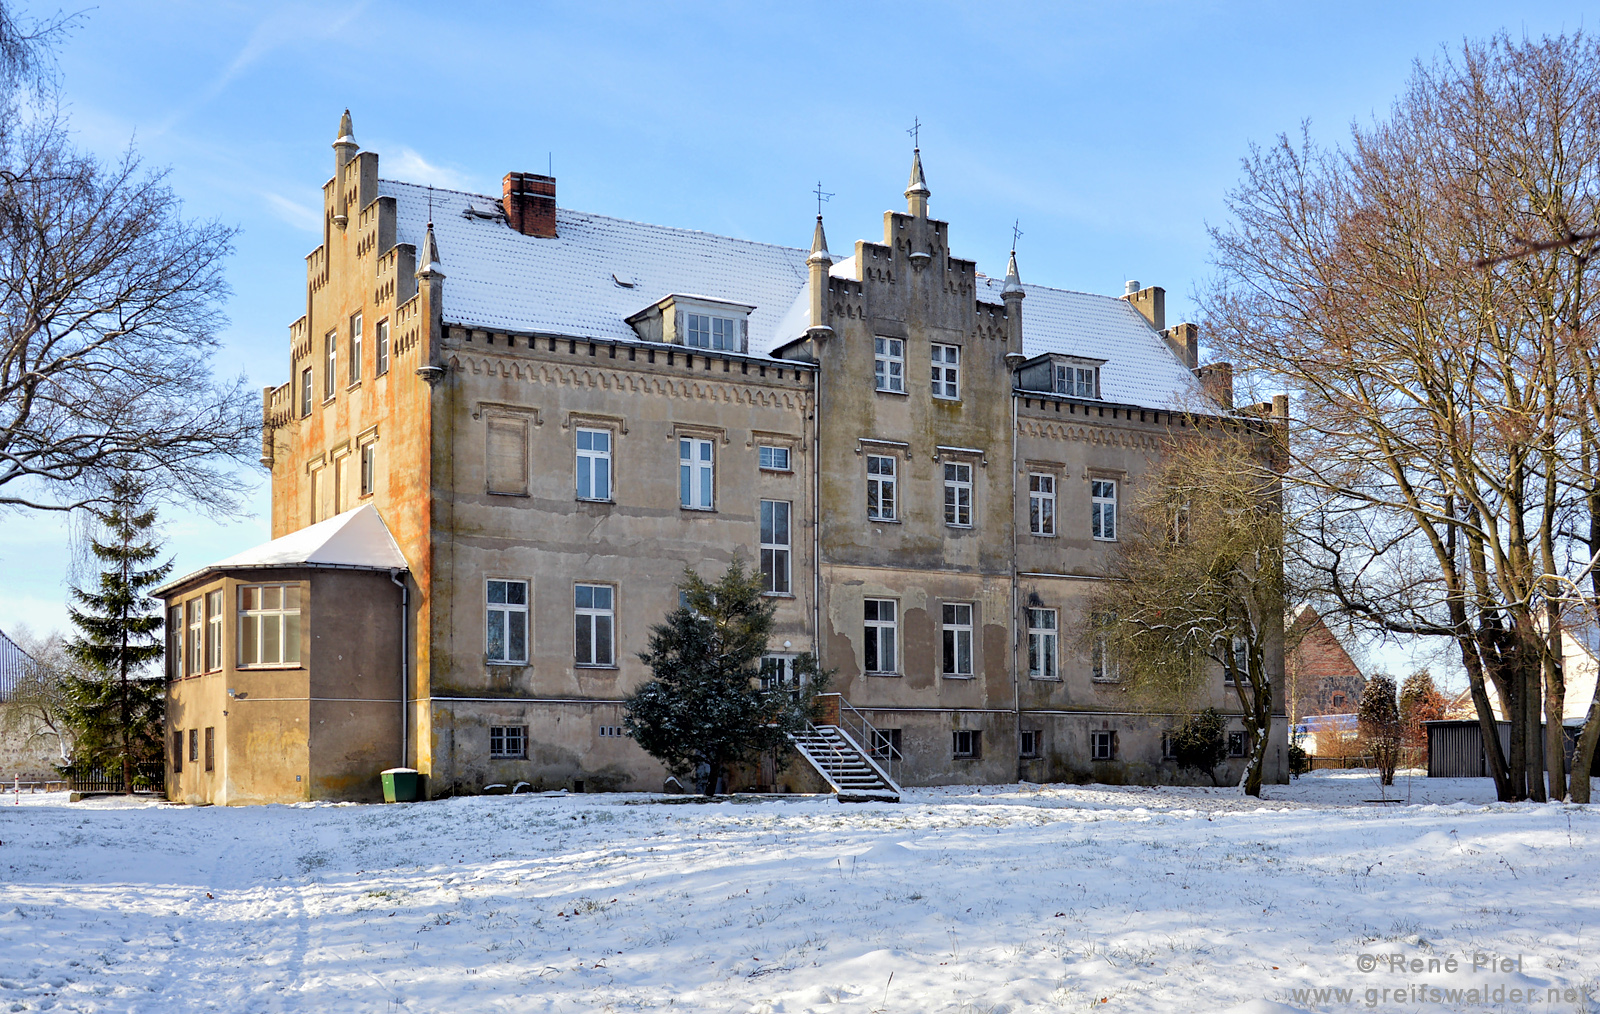 Schloss Wrangelsburg